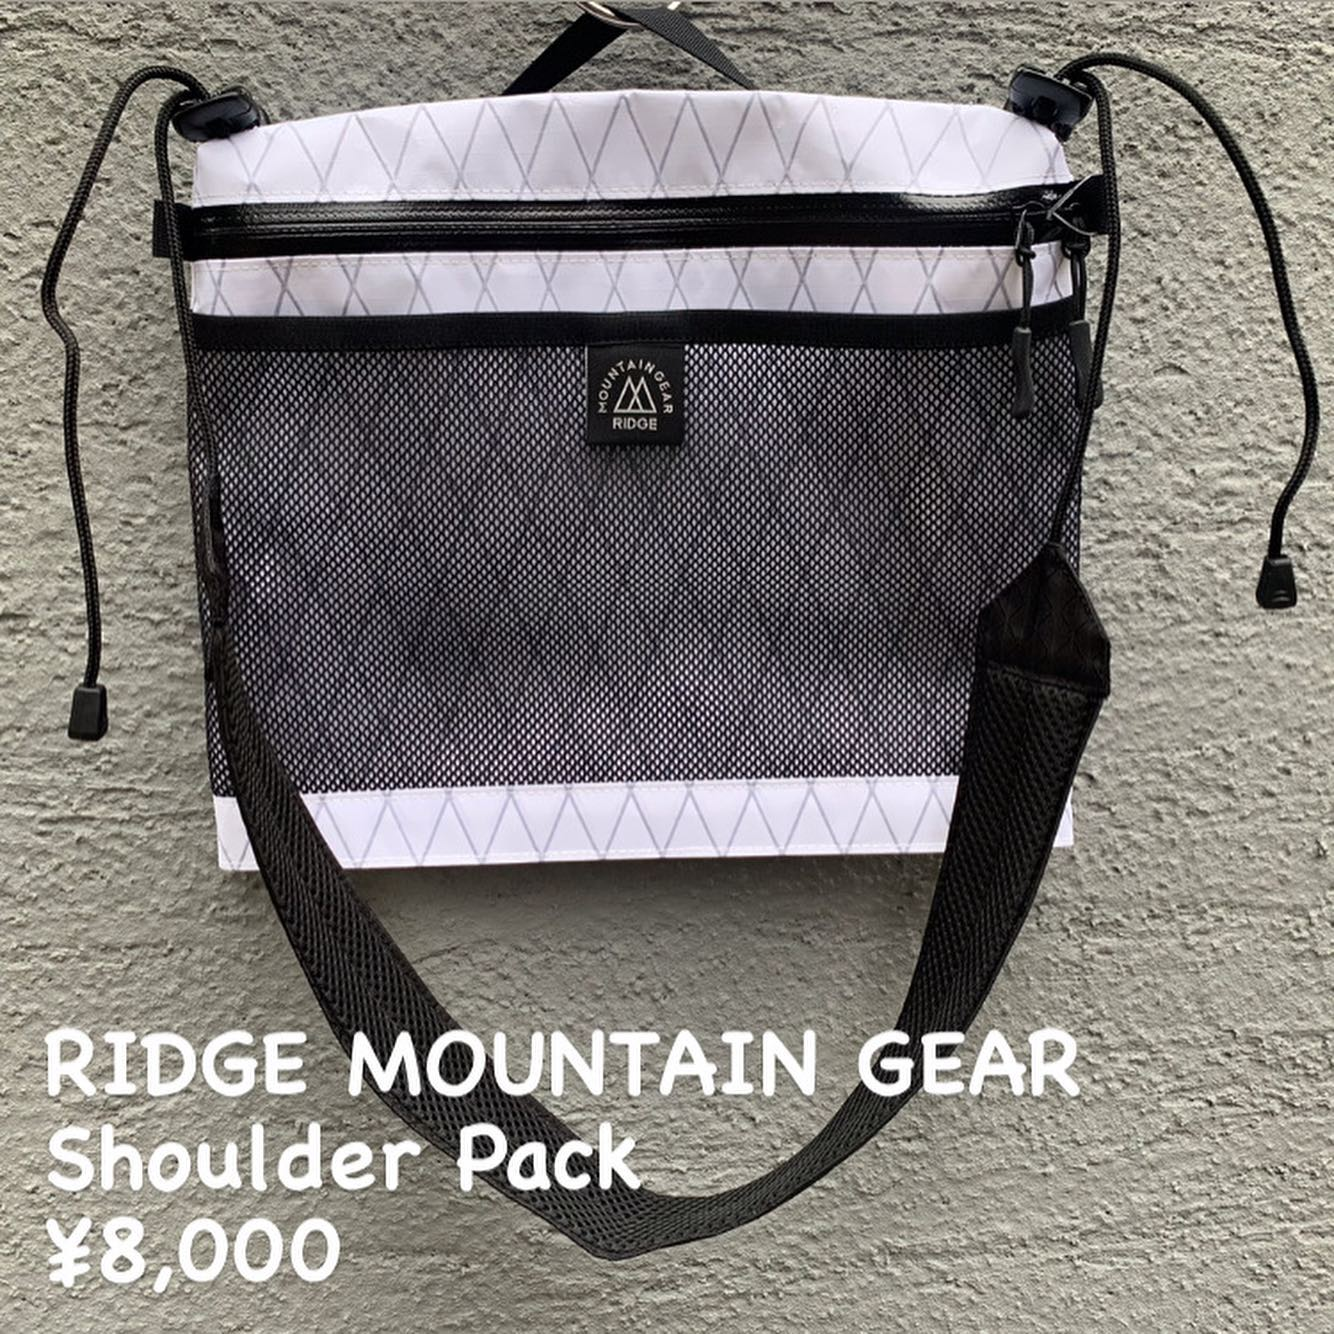 『RIDGE MOUNTAIN GEAR ショルダーパック』のご紹介